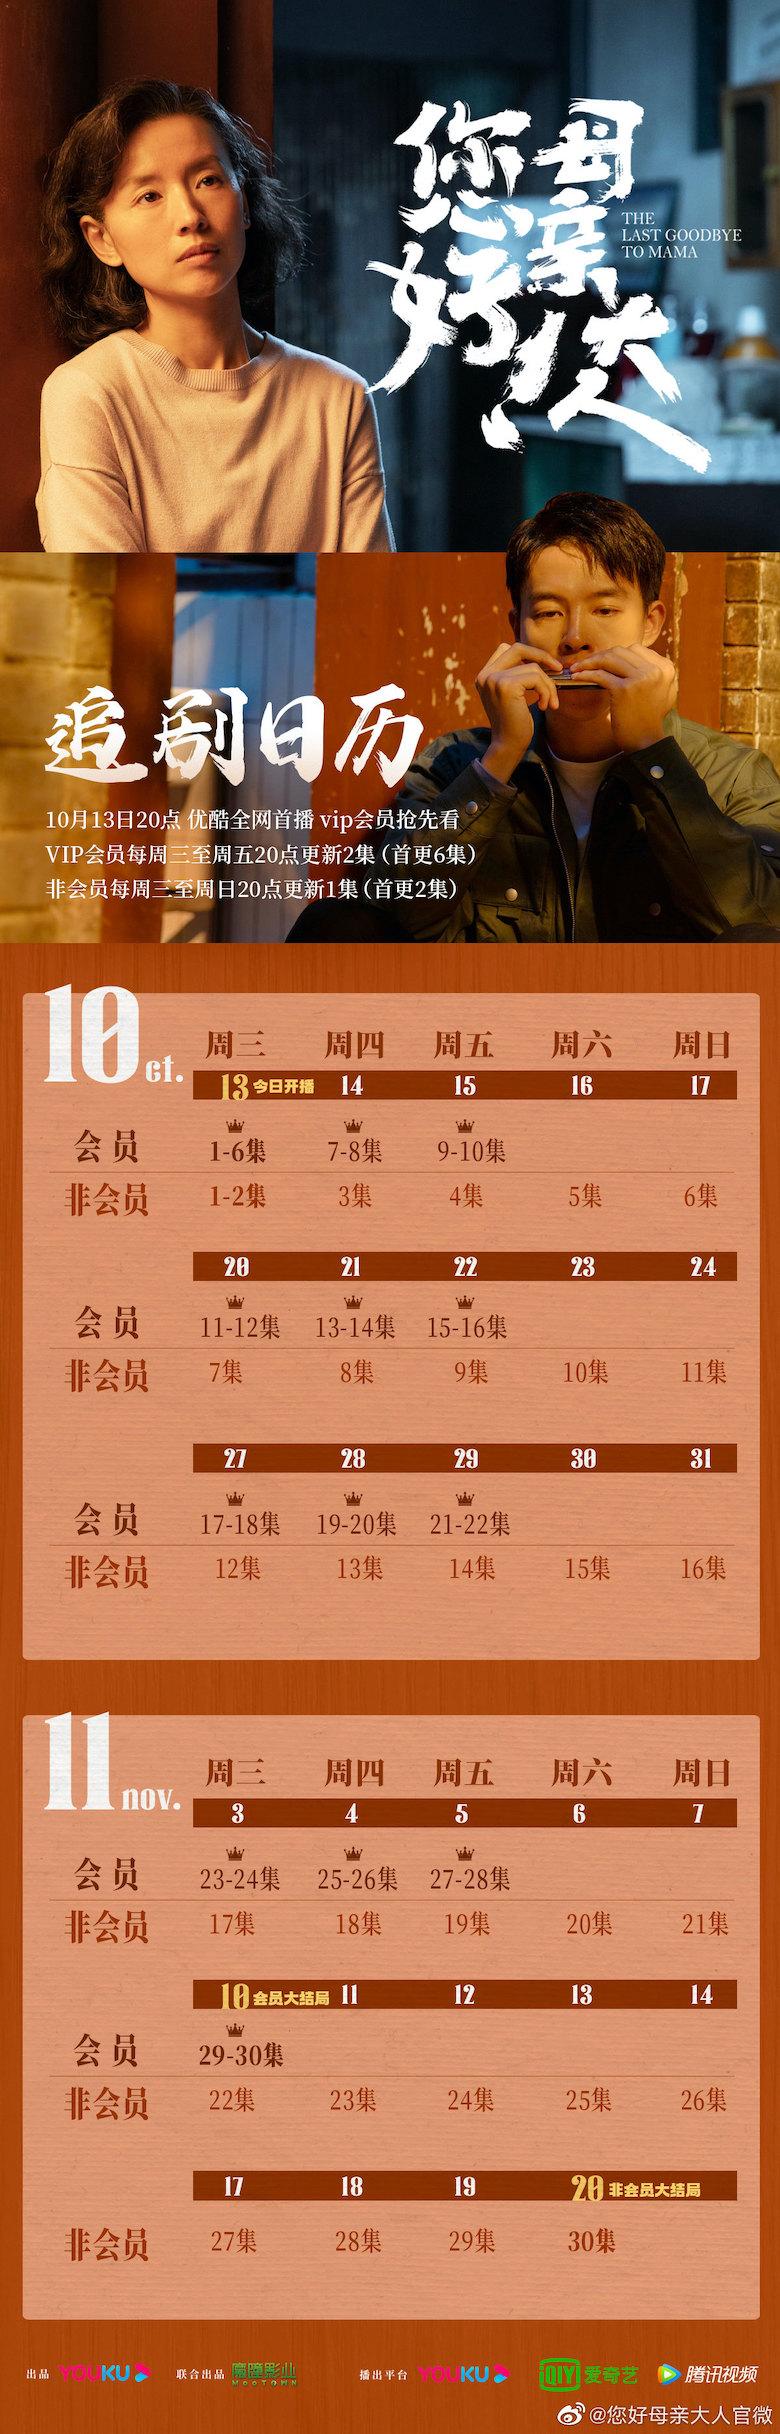 The Last Goodbye to Mama Chinese Drama Airing Calendar